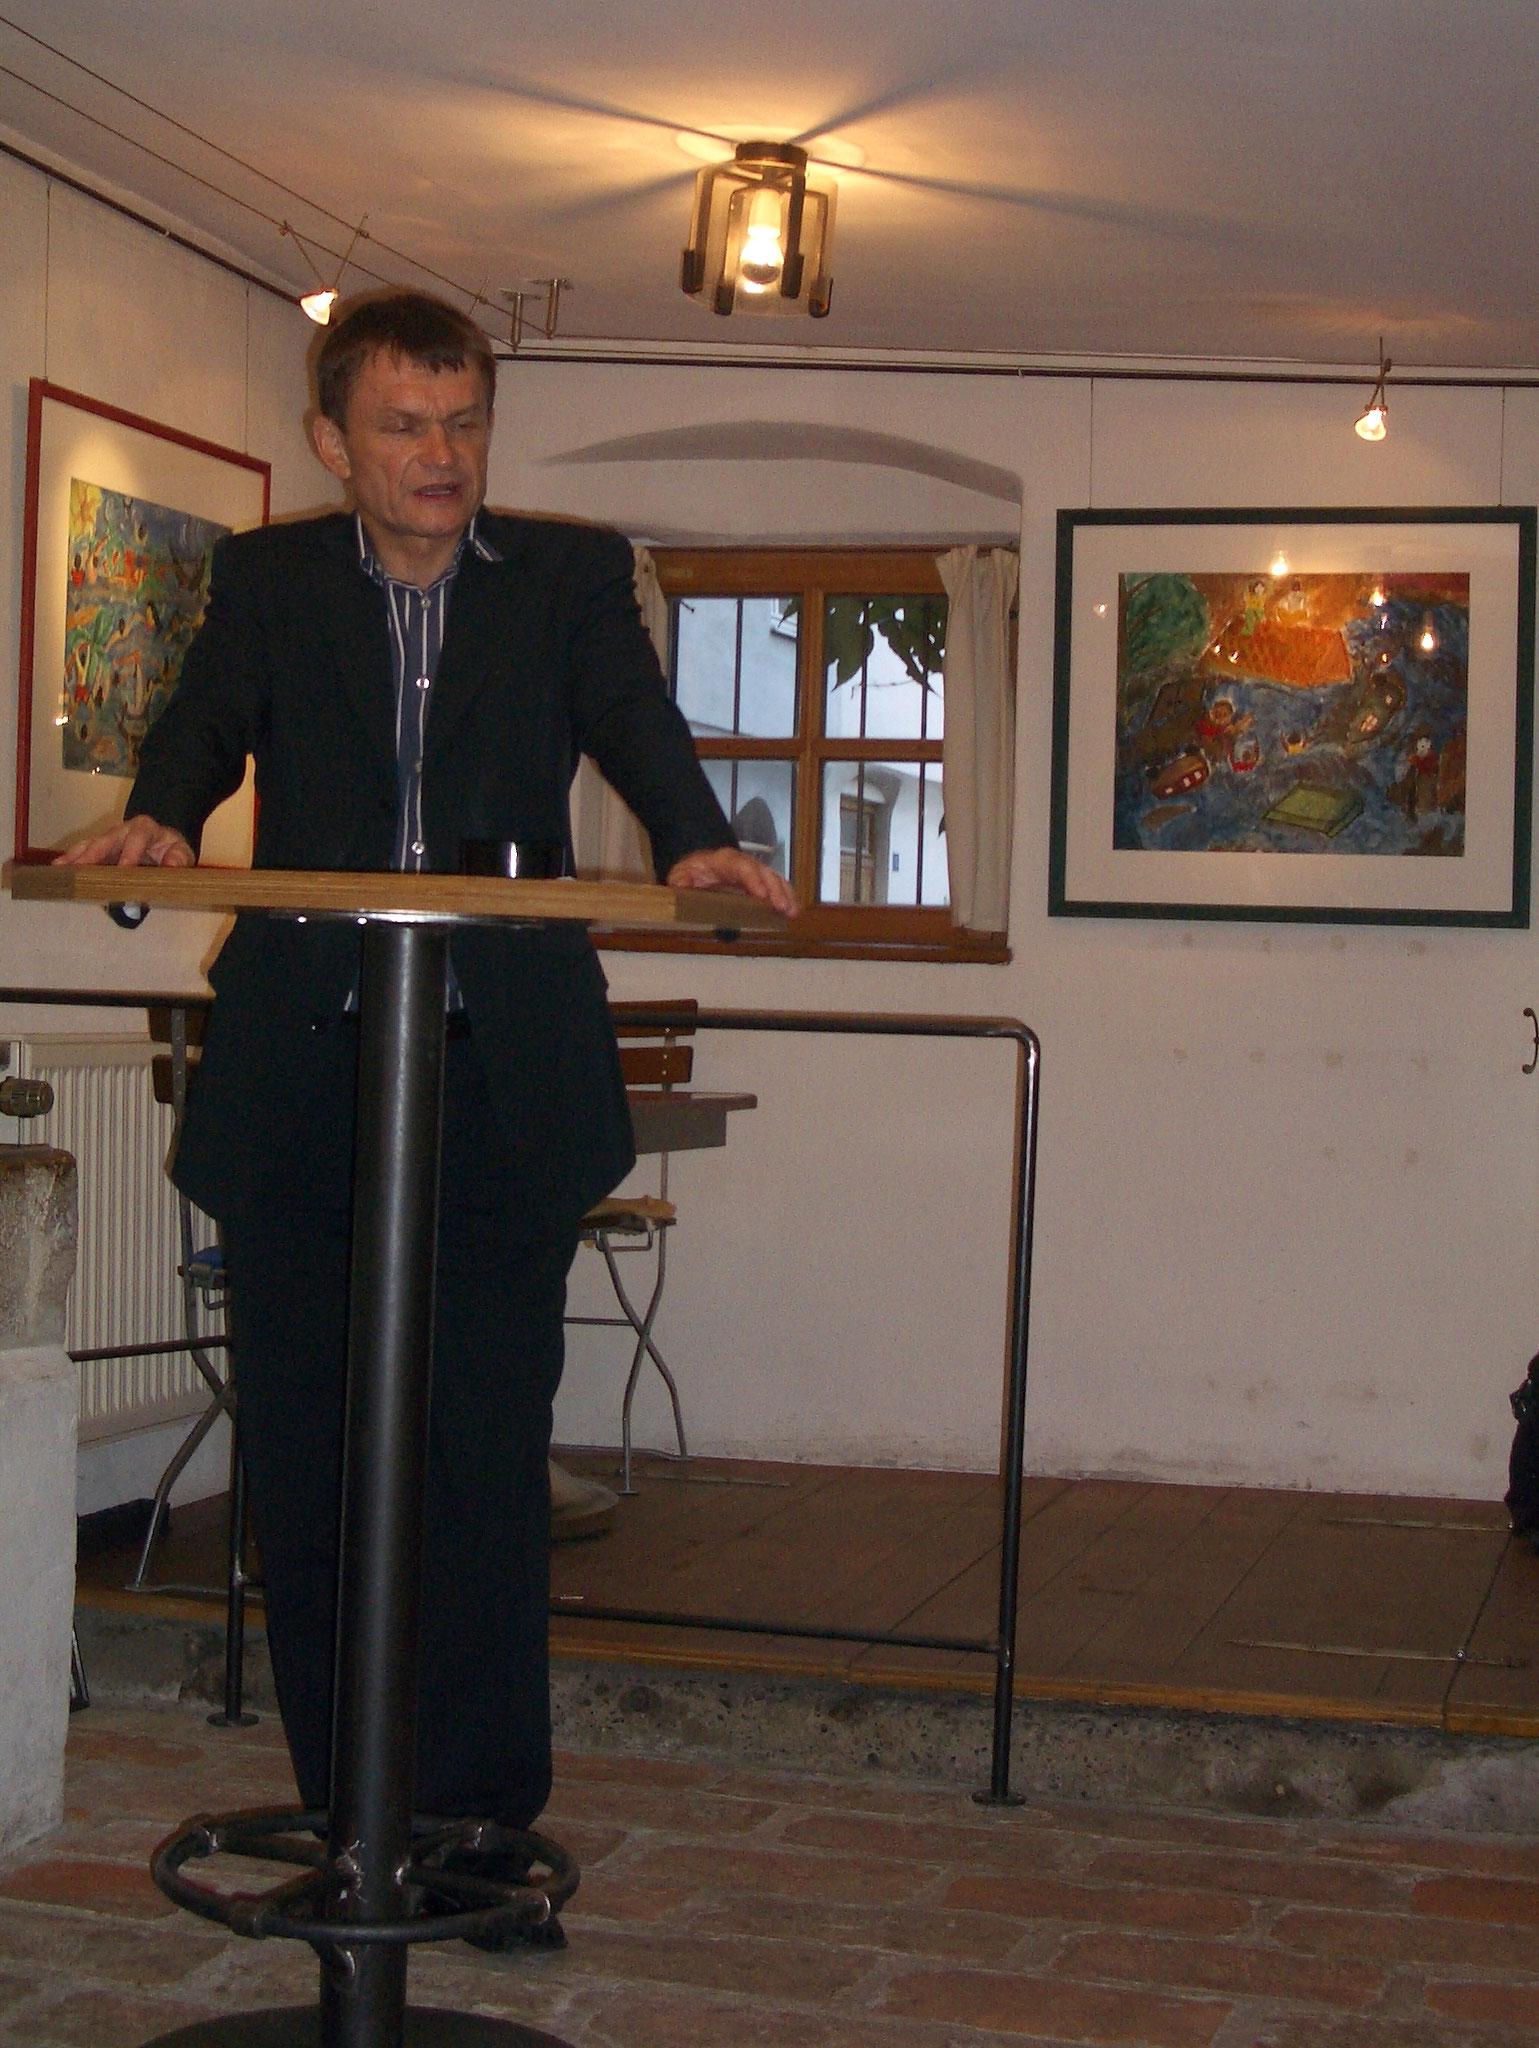 Freiwilligen-Zentrum Augsburg - Tsunami-Wanderausstellung 2005 Galerie Schröder - Foto: Wolfgang F. Lightmaster